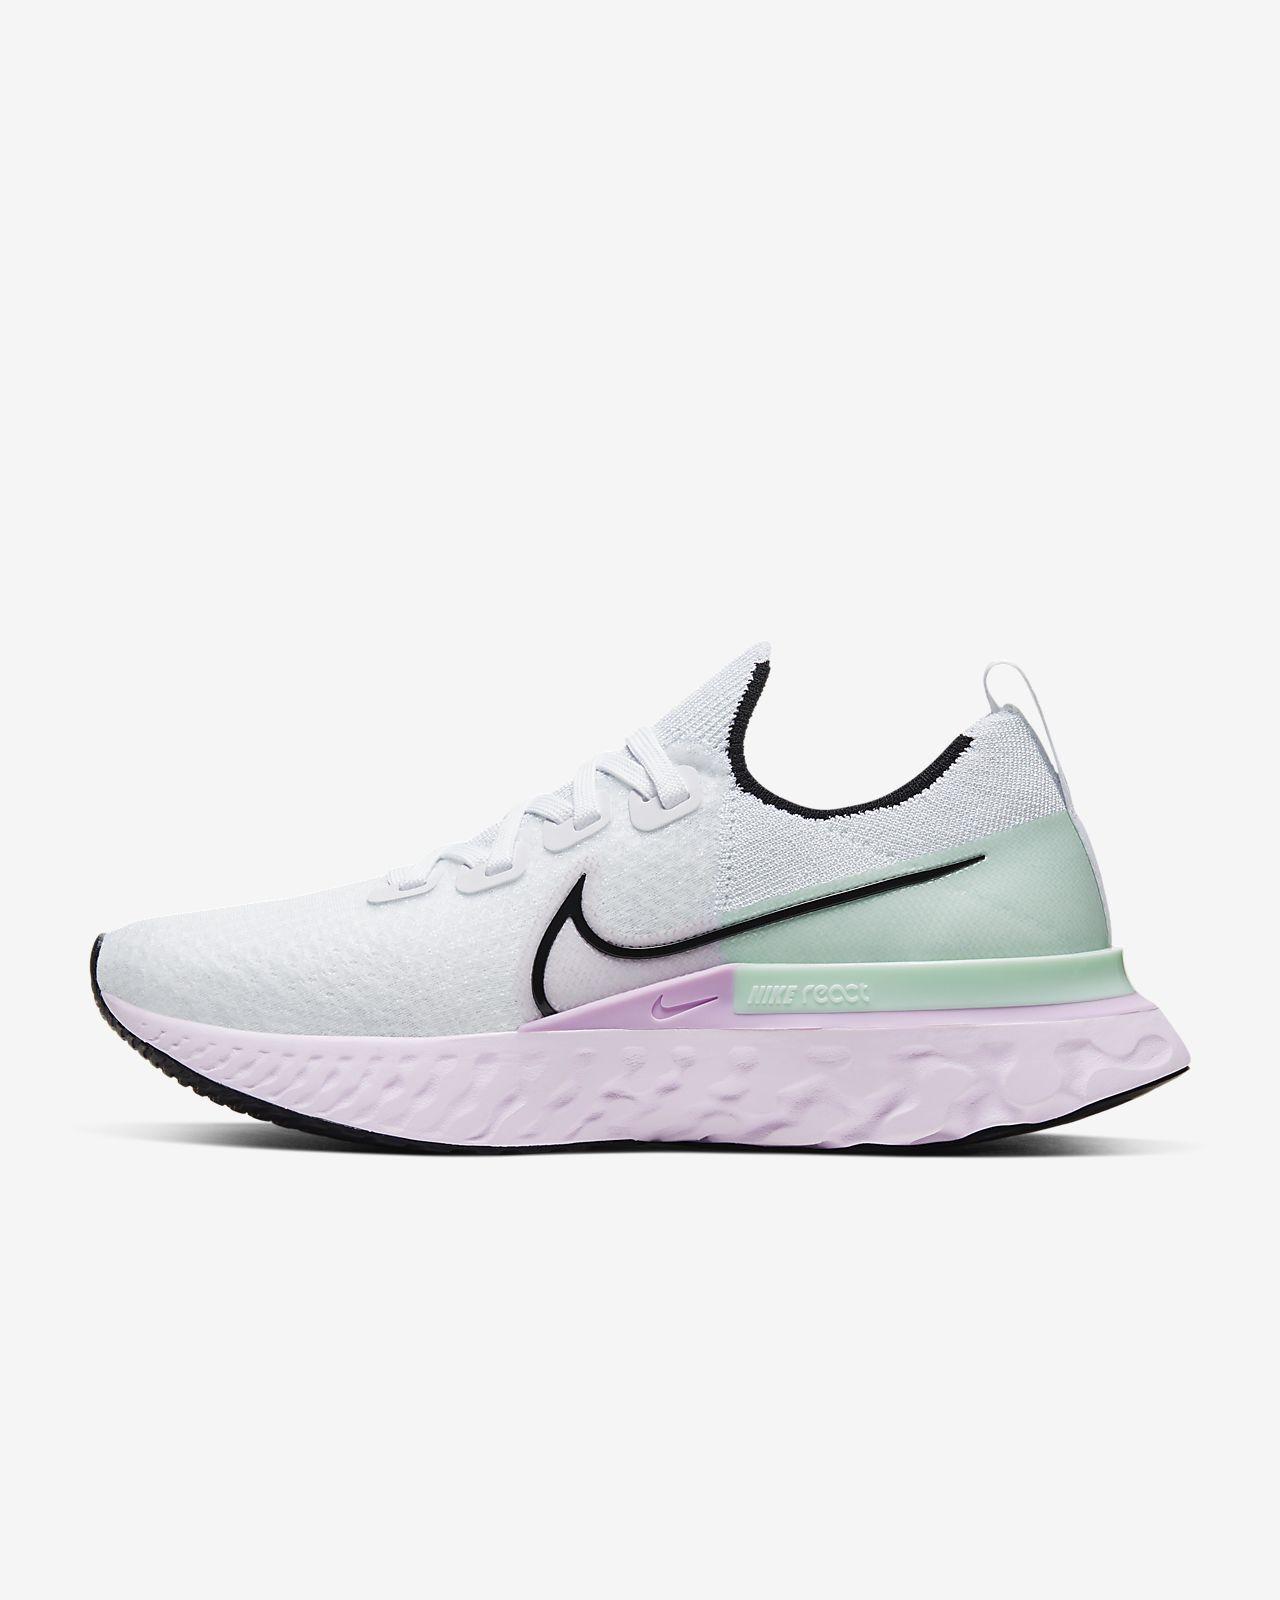 Nike React Infinity Run Flyknit Women's